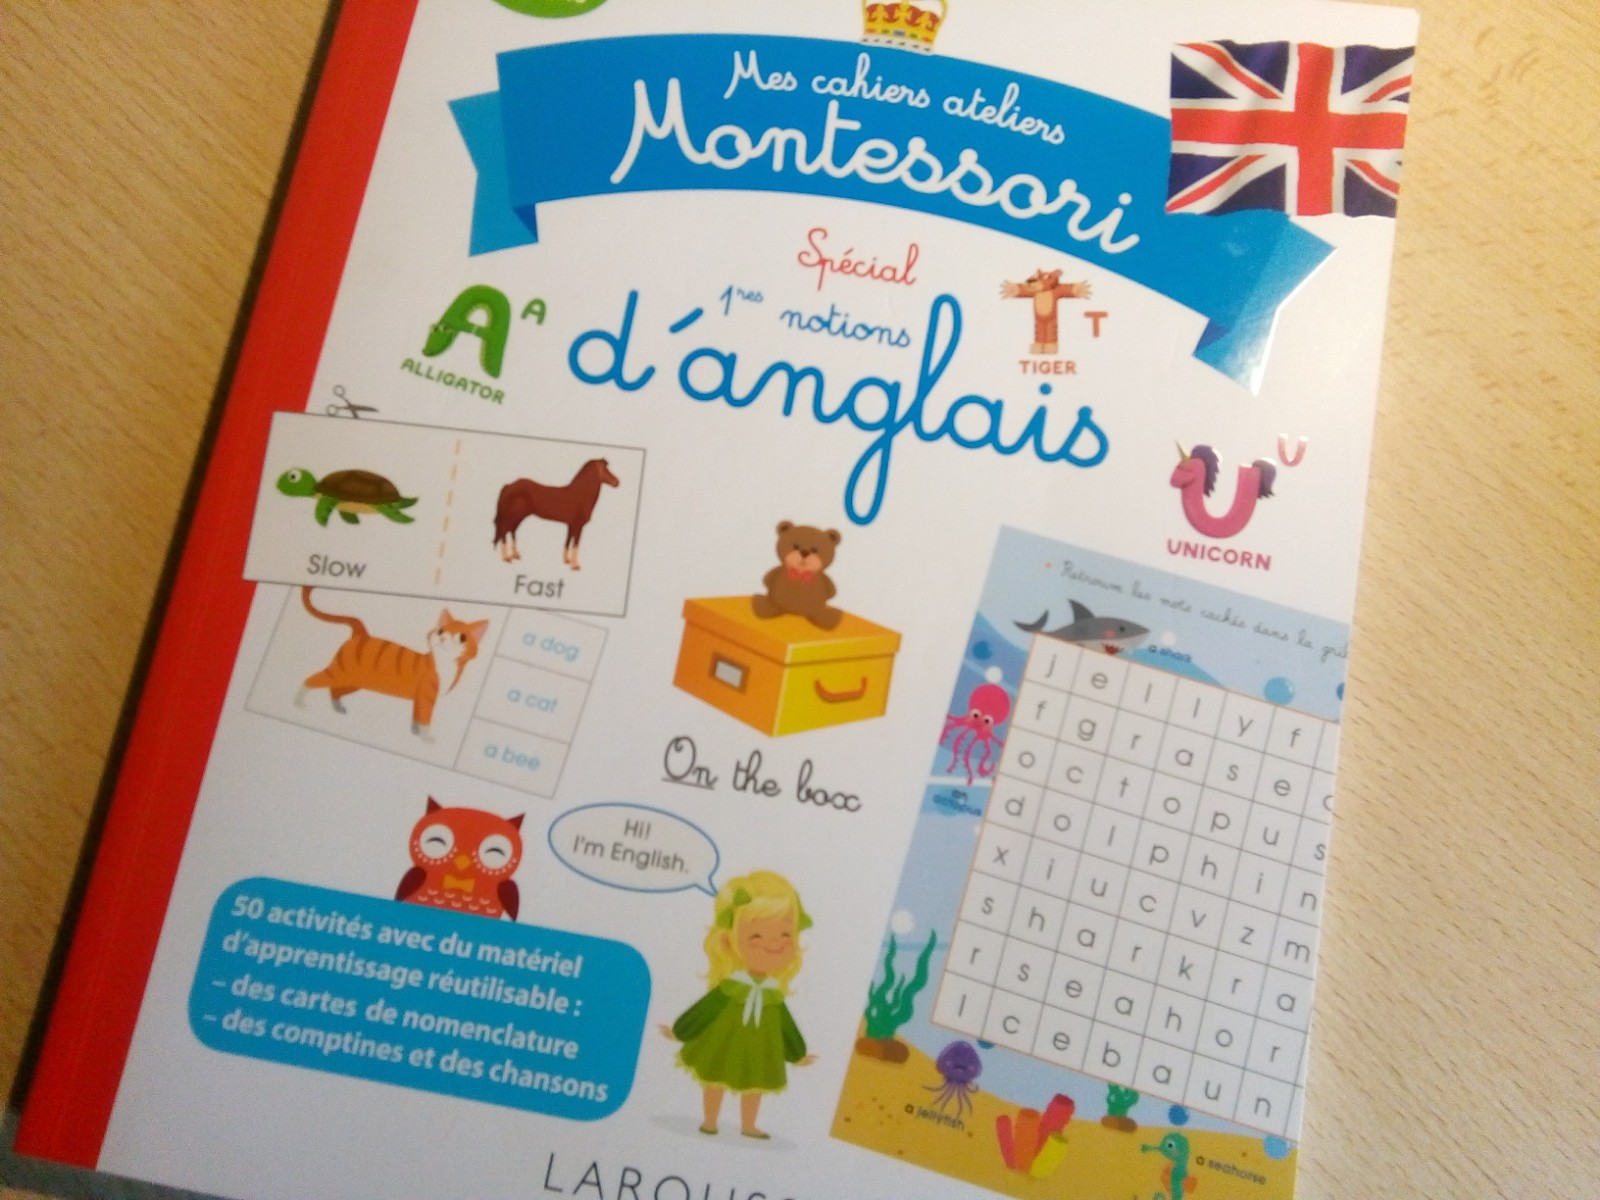 Un Cahier D Activites Inspirees Par La Pedagogie Montessori